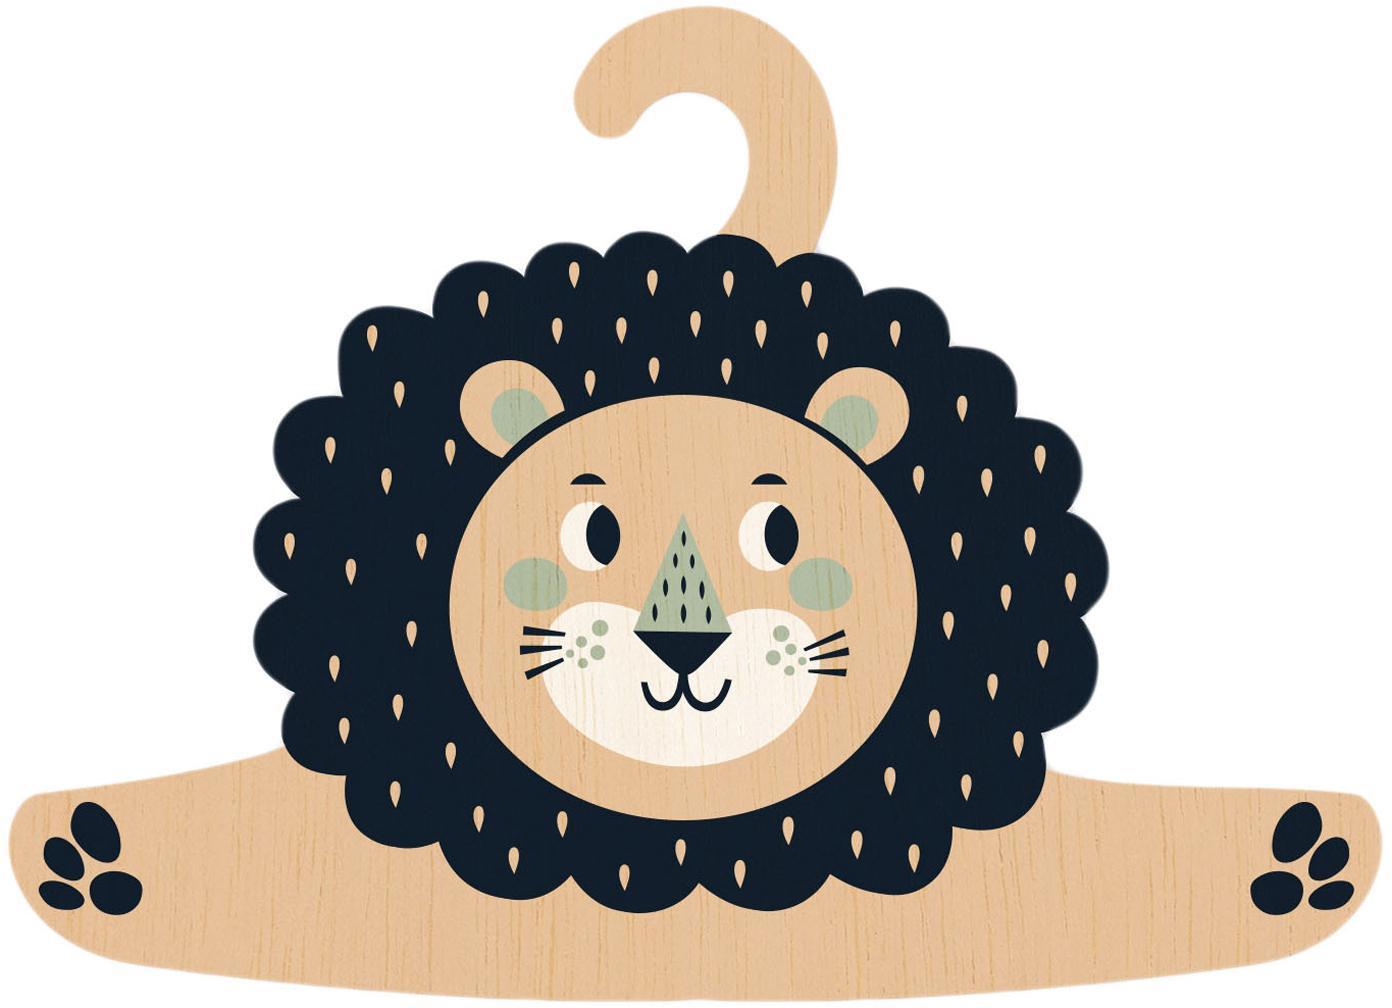 Percha Lion, Madera contrachapada, recubierta, Negro, beige, verde menta, crema, An 30 x Al 30 cm